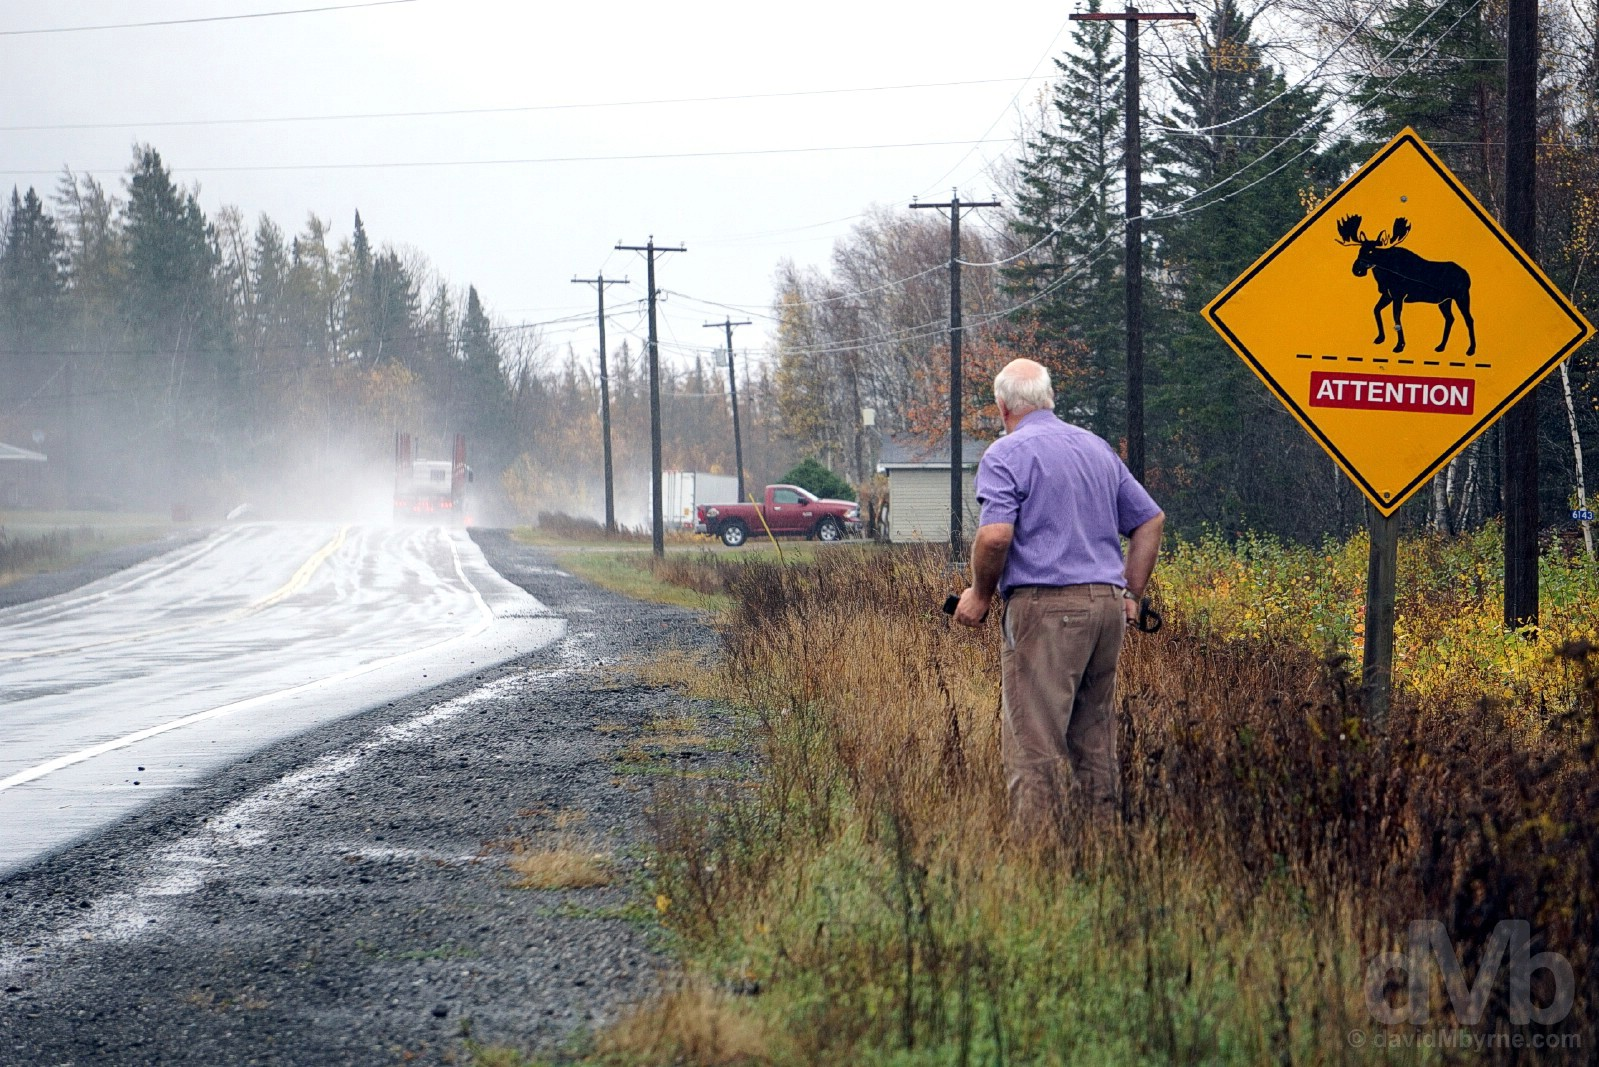 Route 3, New Brunswick, Canada. October 26, 2017.